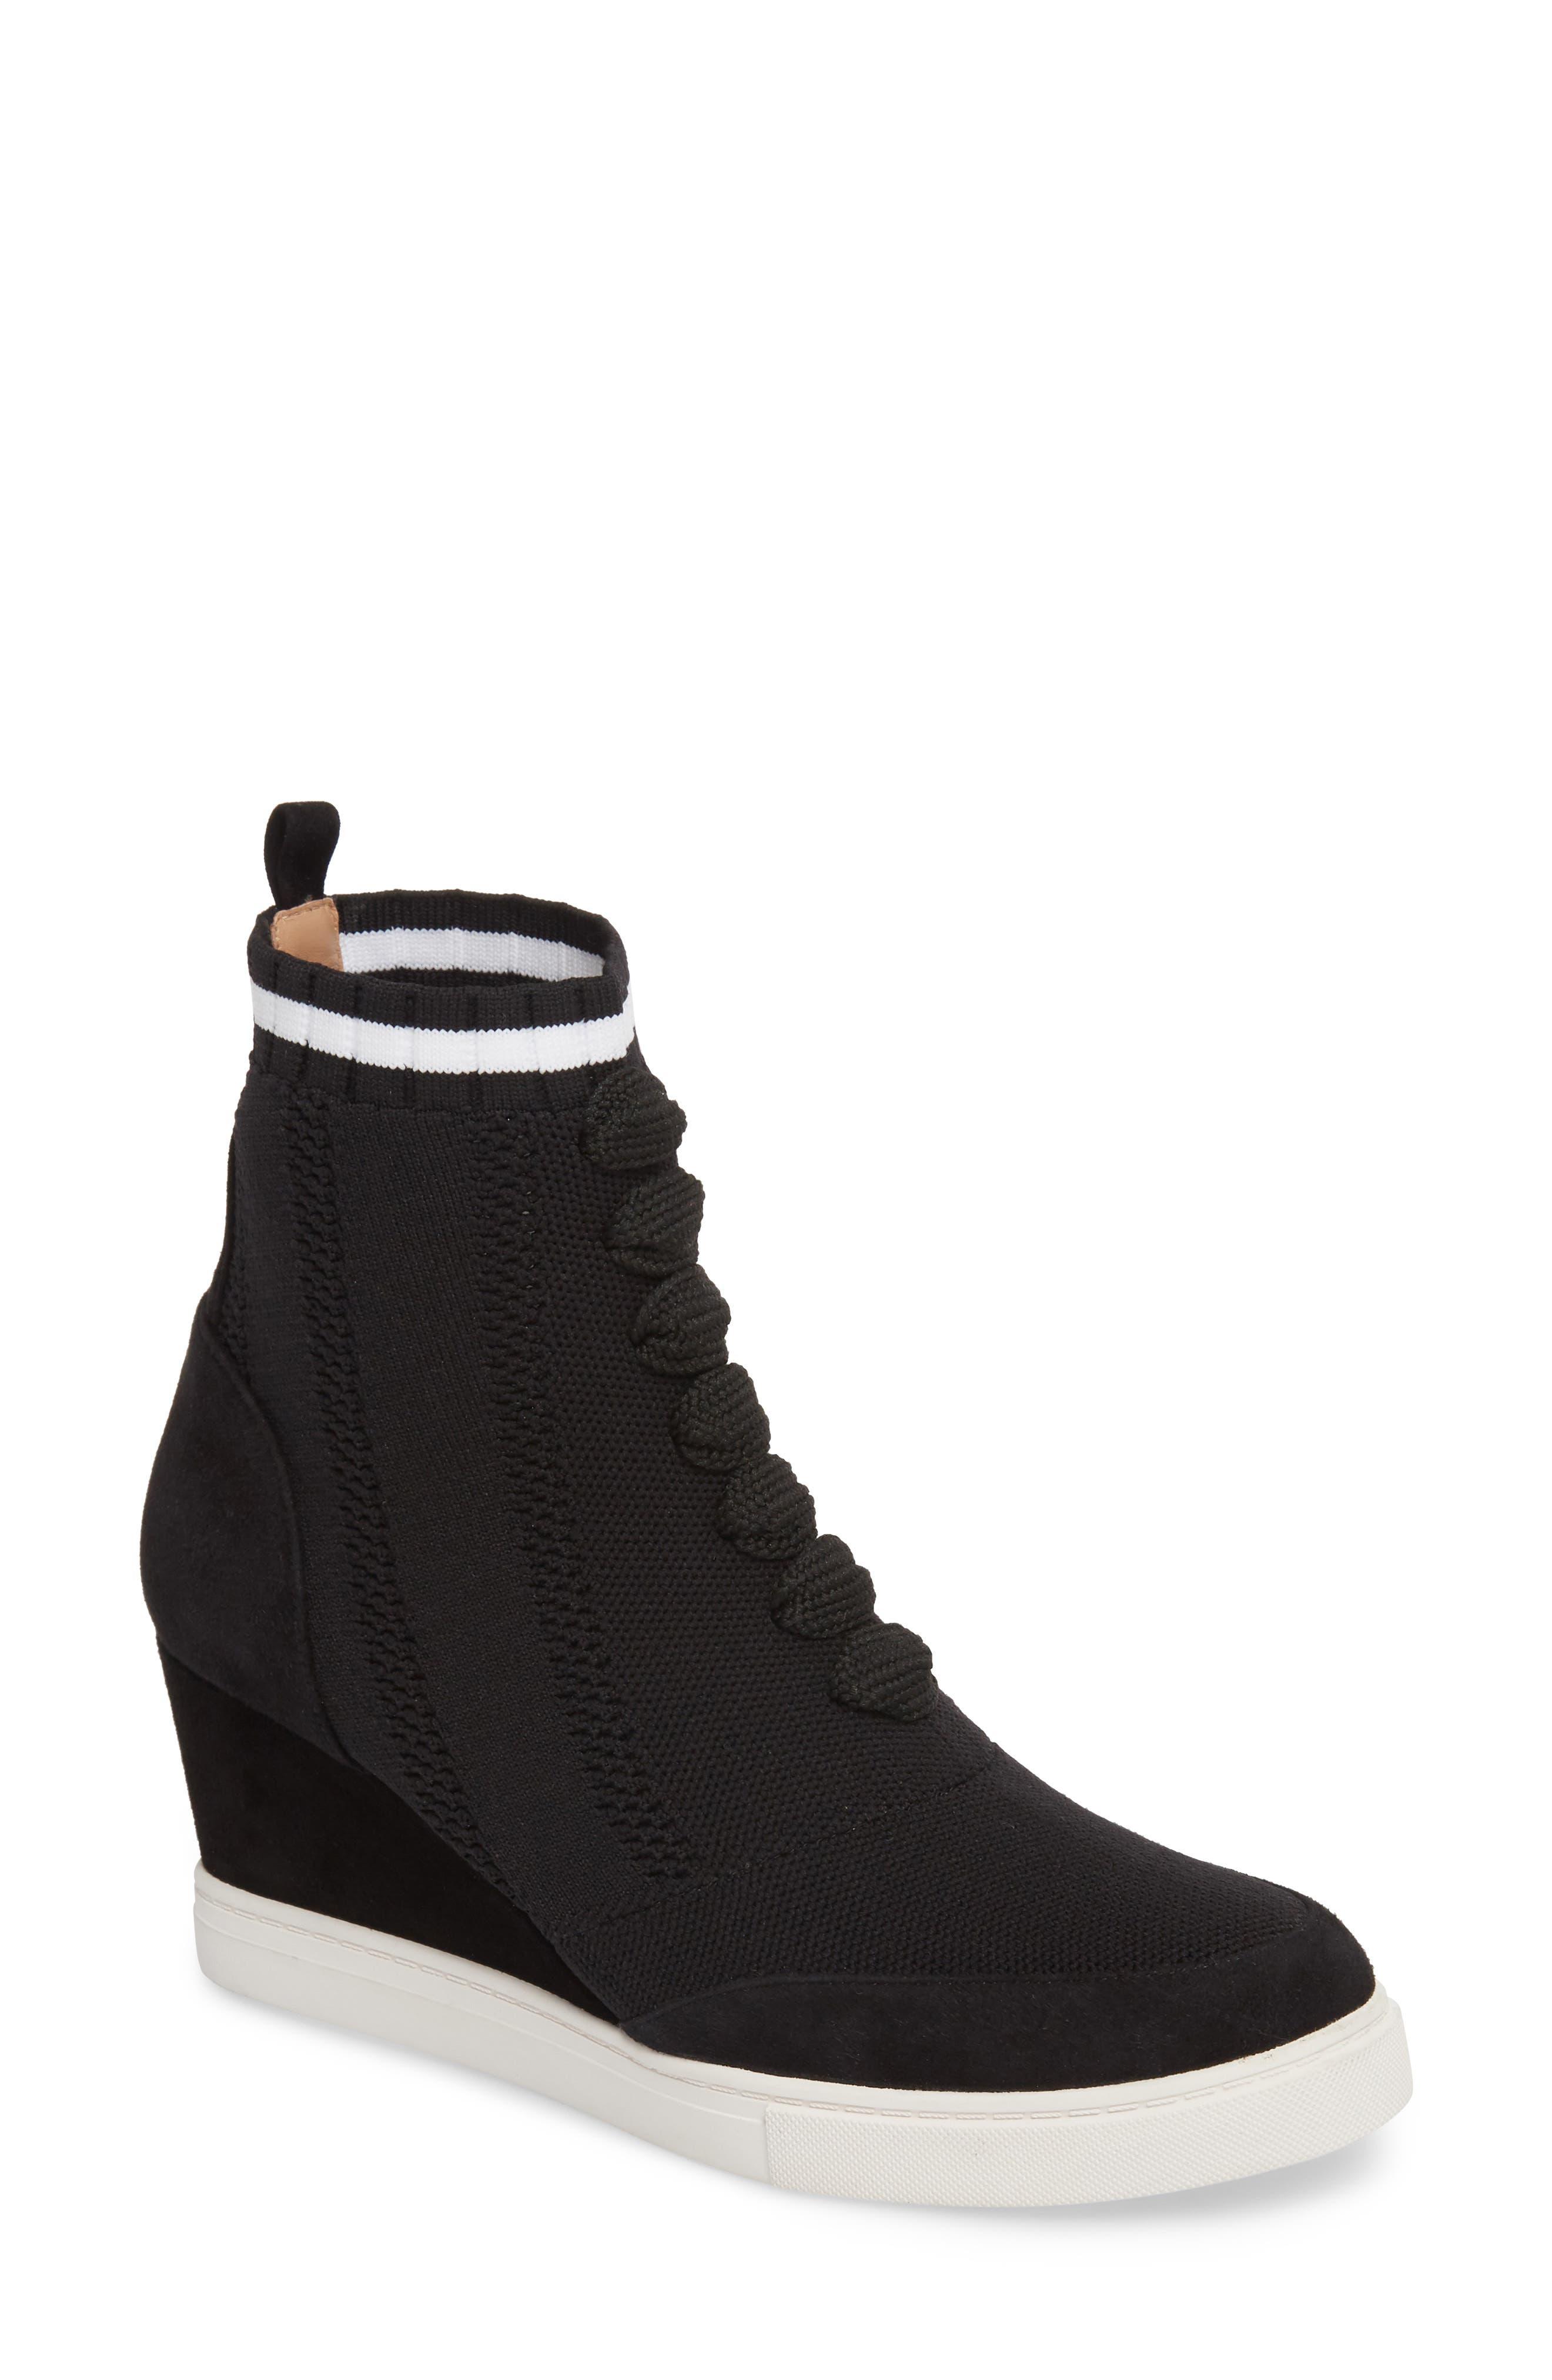 Fabiana Wedge Sneaker,                         Main,                         color, BLACK SUEDE